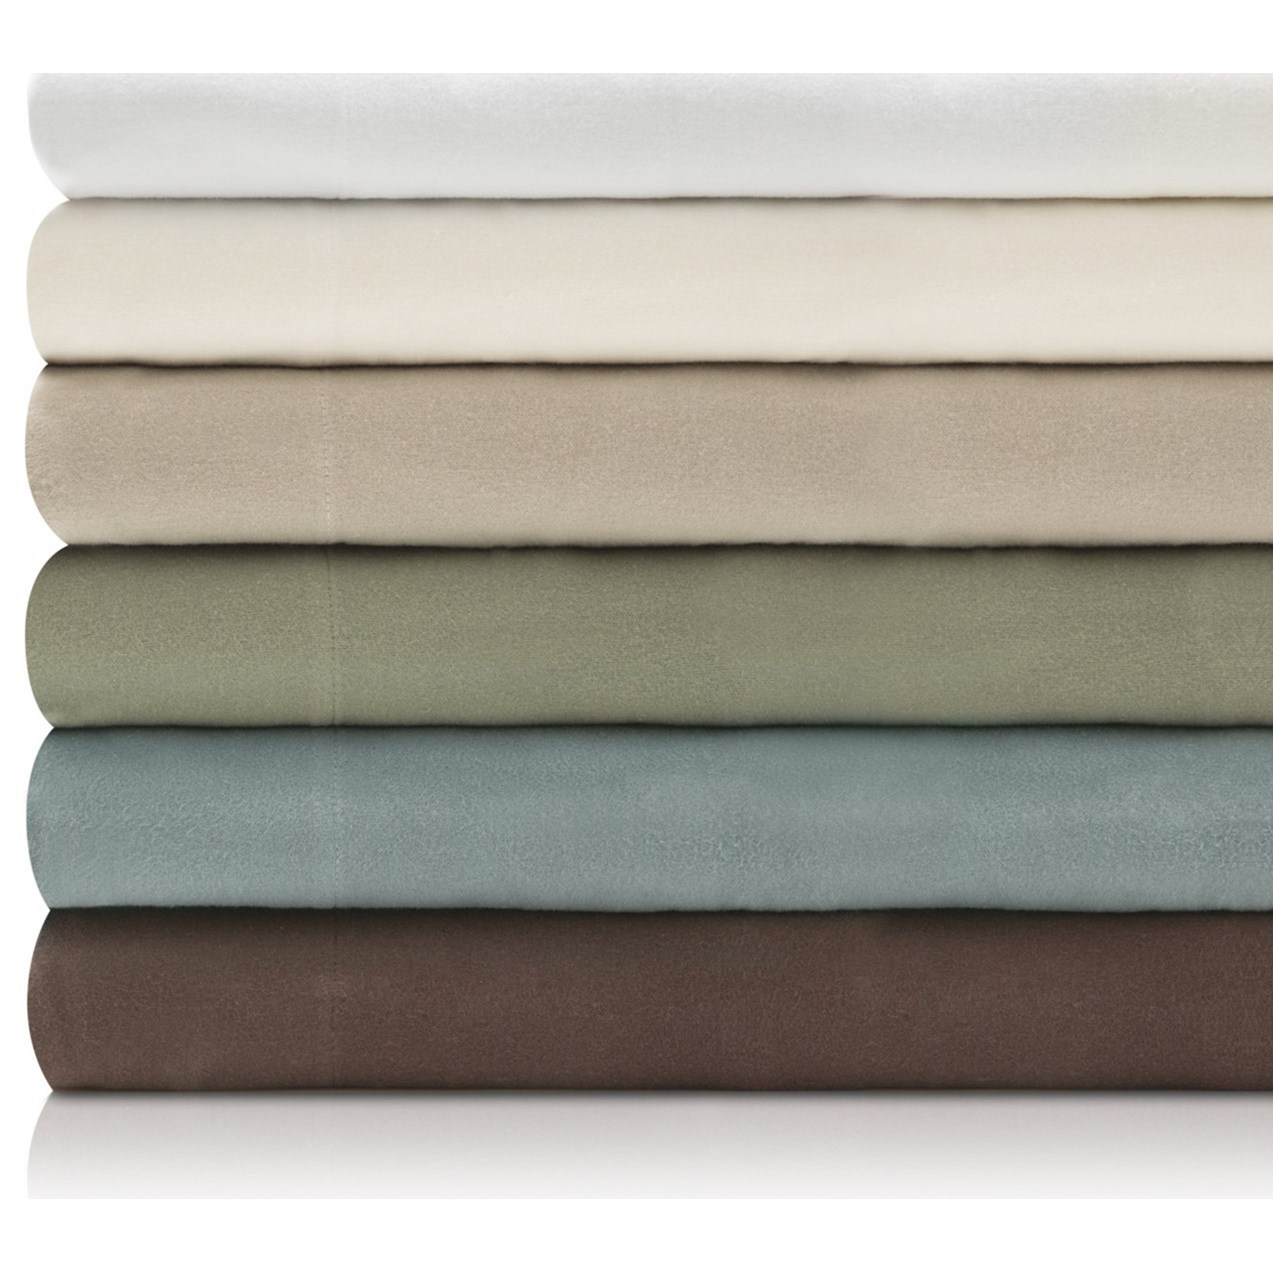 Malouf Portuguese Flannel Queen Woven™ Portuguese Flannel Pillowcases  - Item Number: WO19QQOAFC